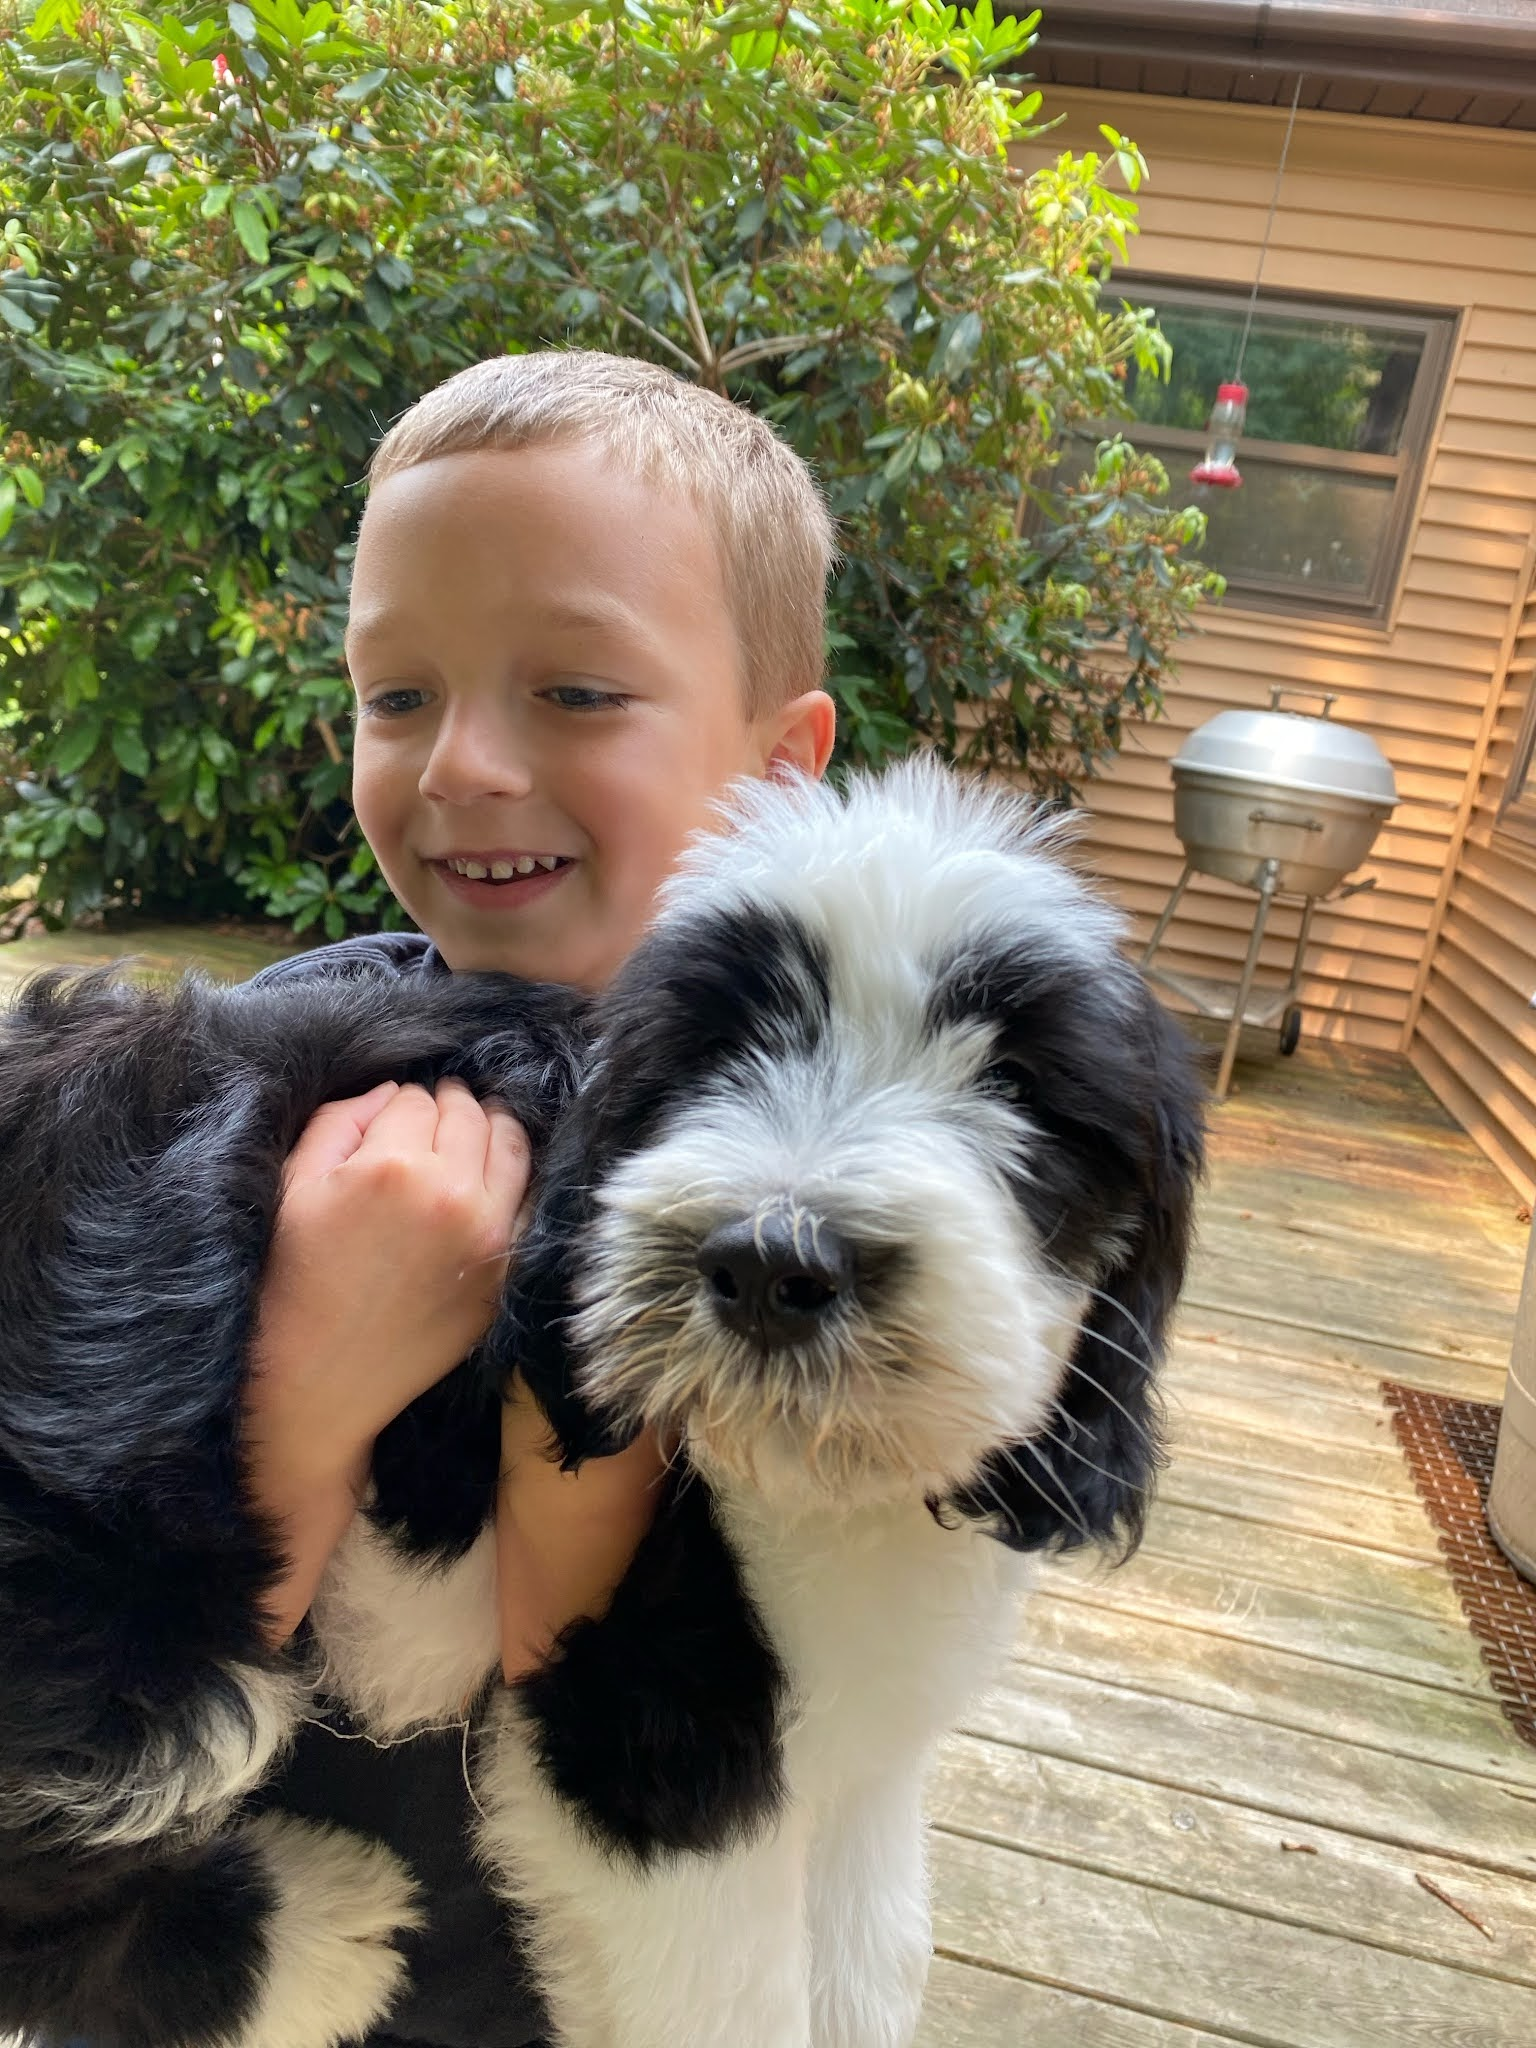 Henry the Puppy | biblio-style.com